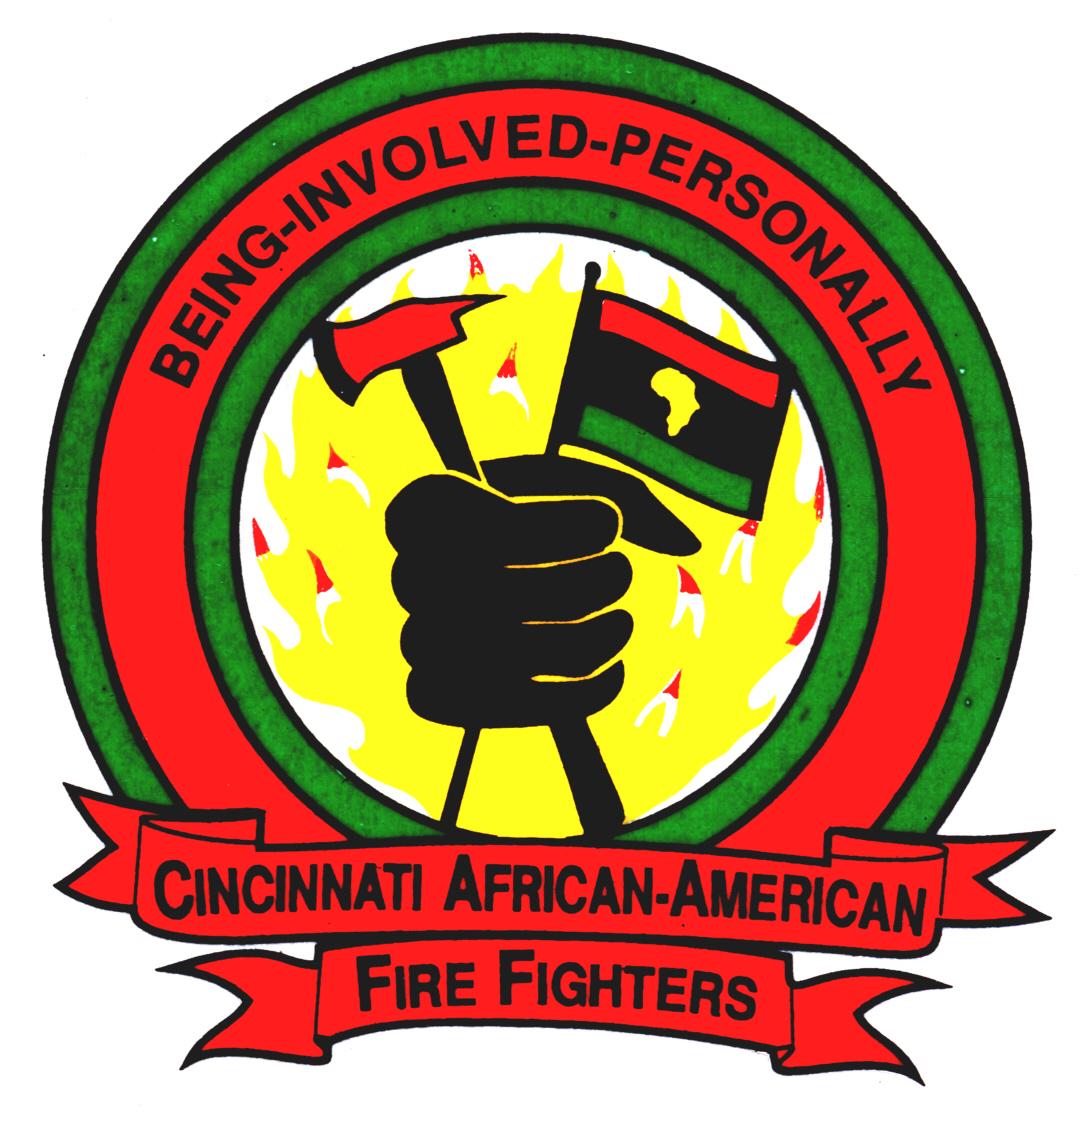 Cincinnati African-American Fire Fighters